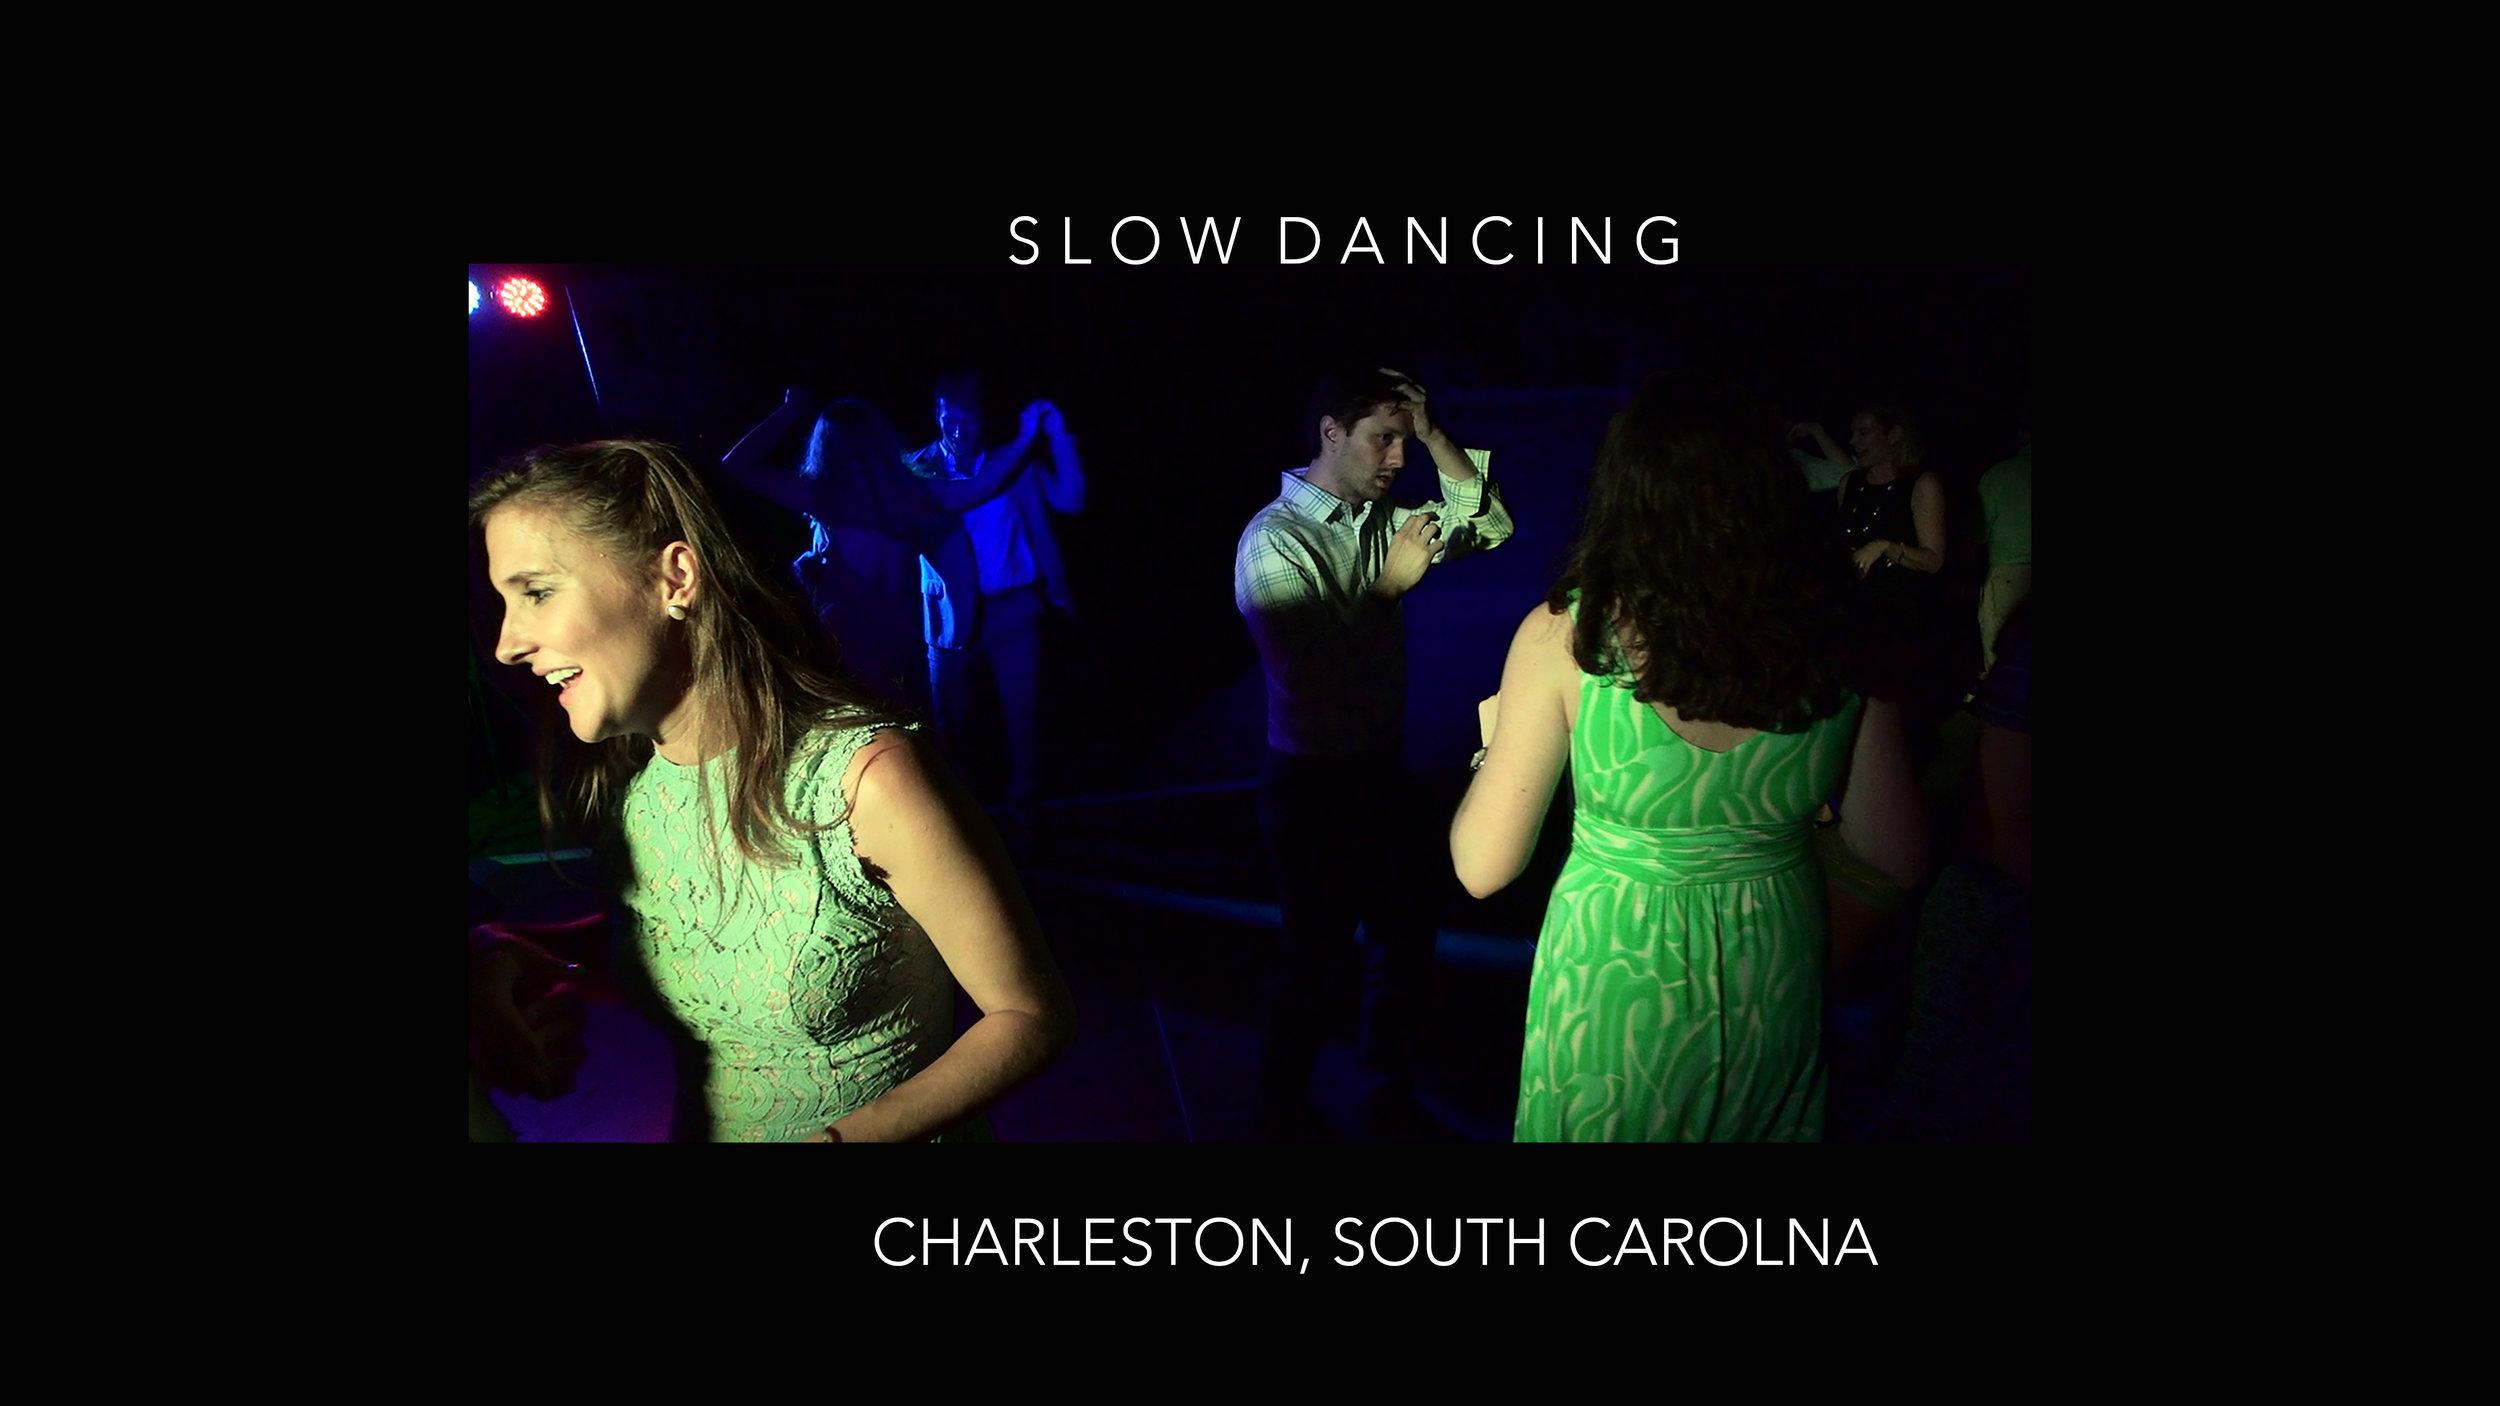 SLOW DANCING poster 16x9.jpg